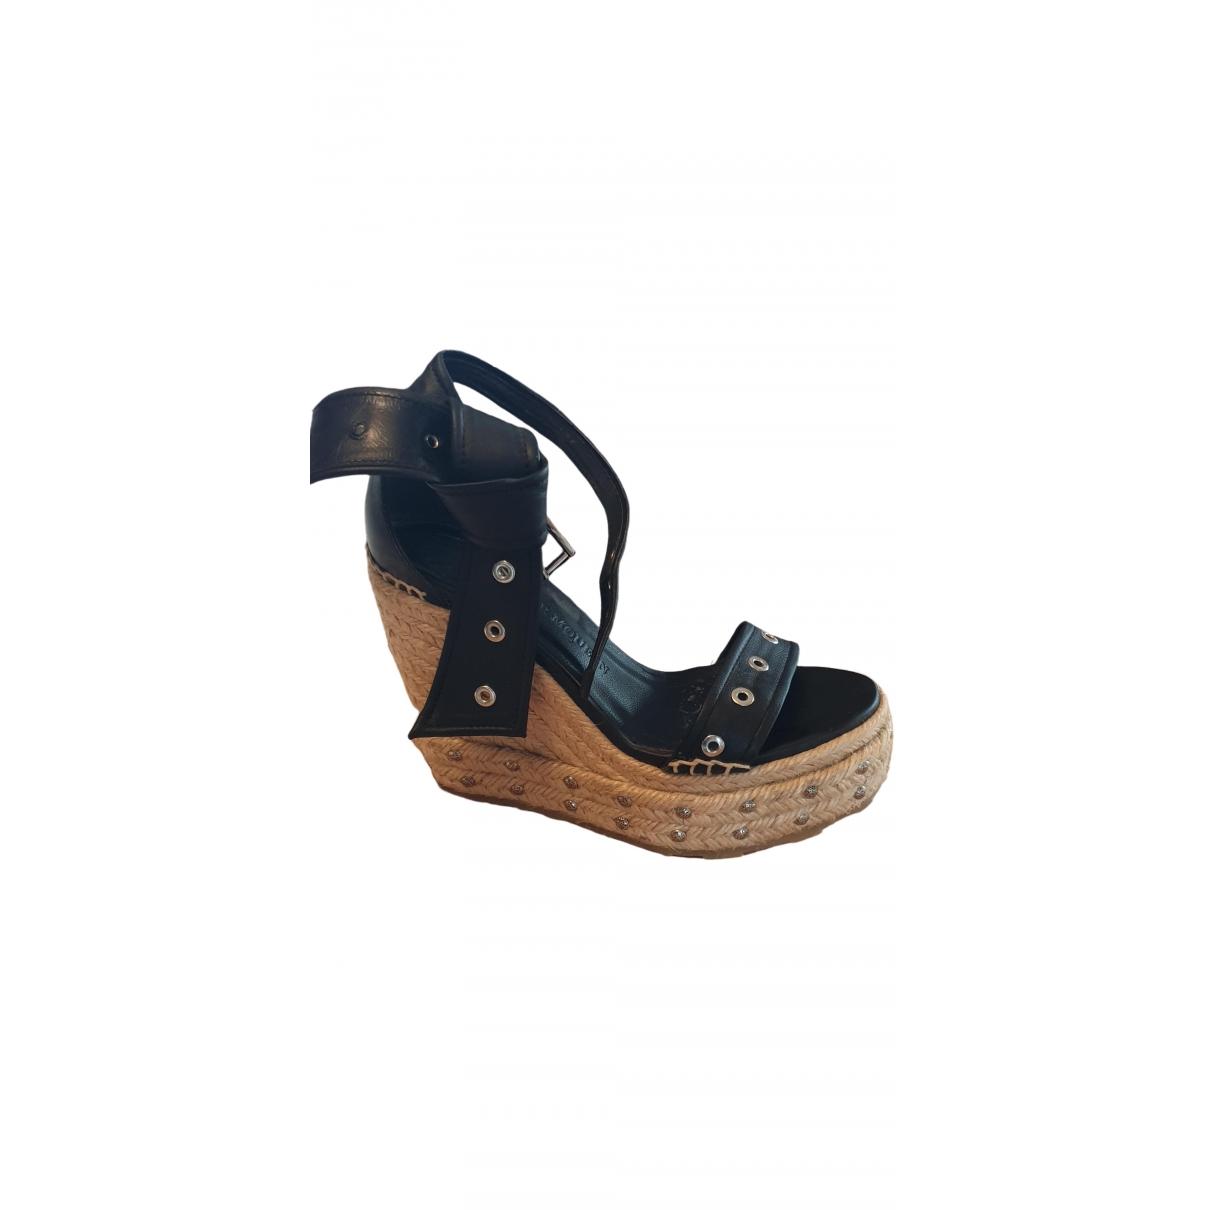 Alexander Mcqueen \N Black Leather Sandals for Women 37.5 EU